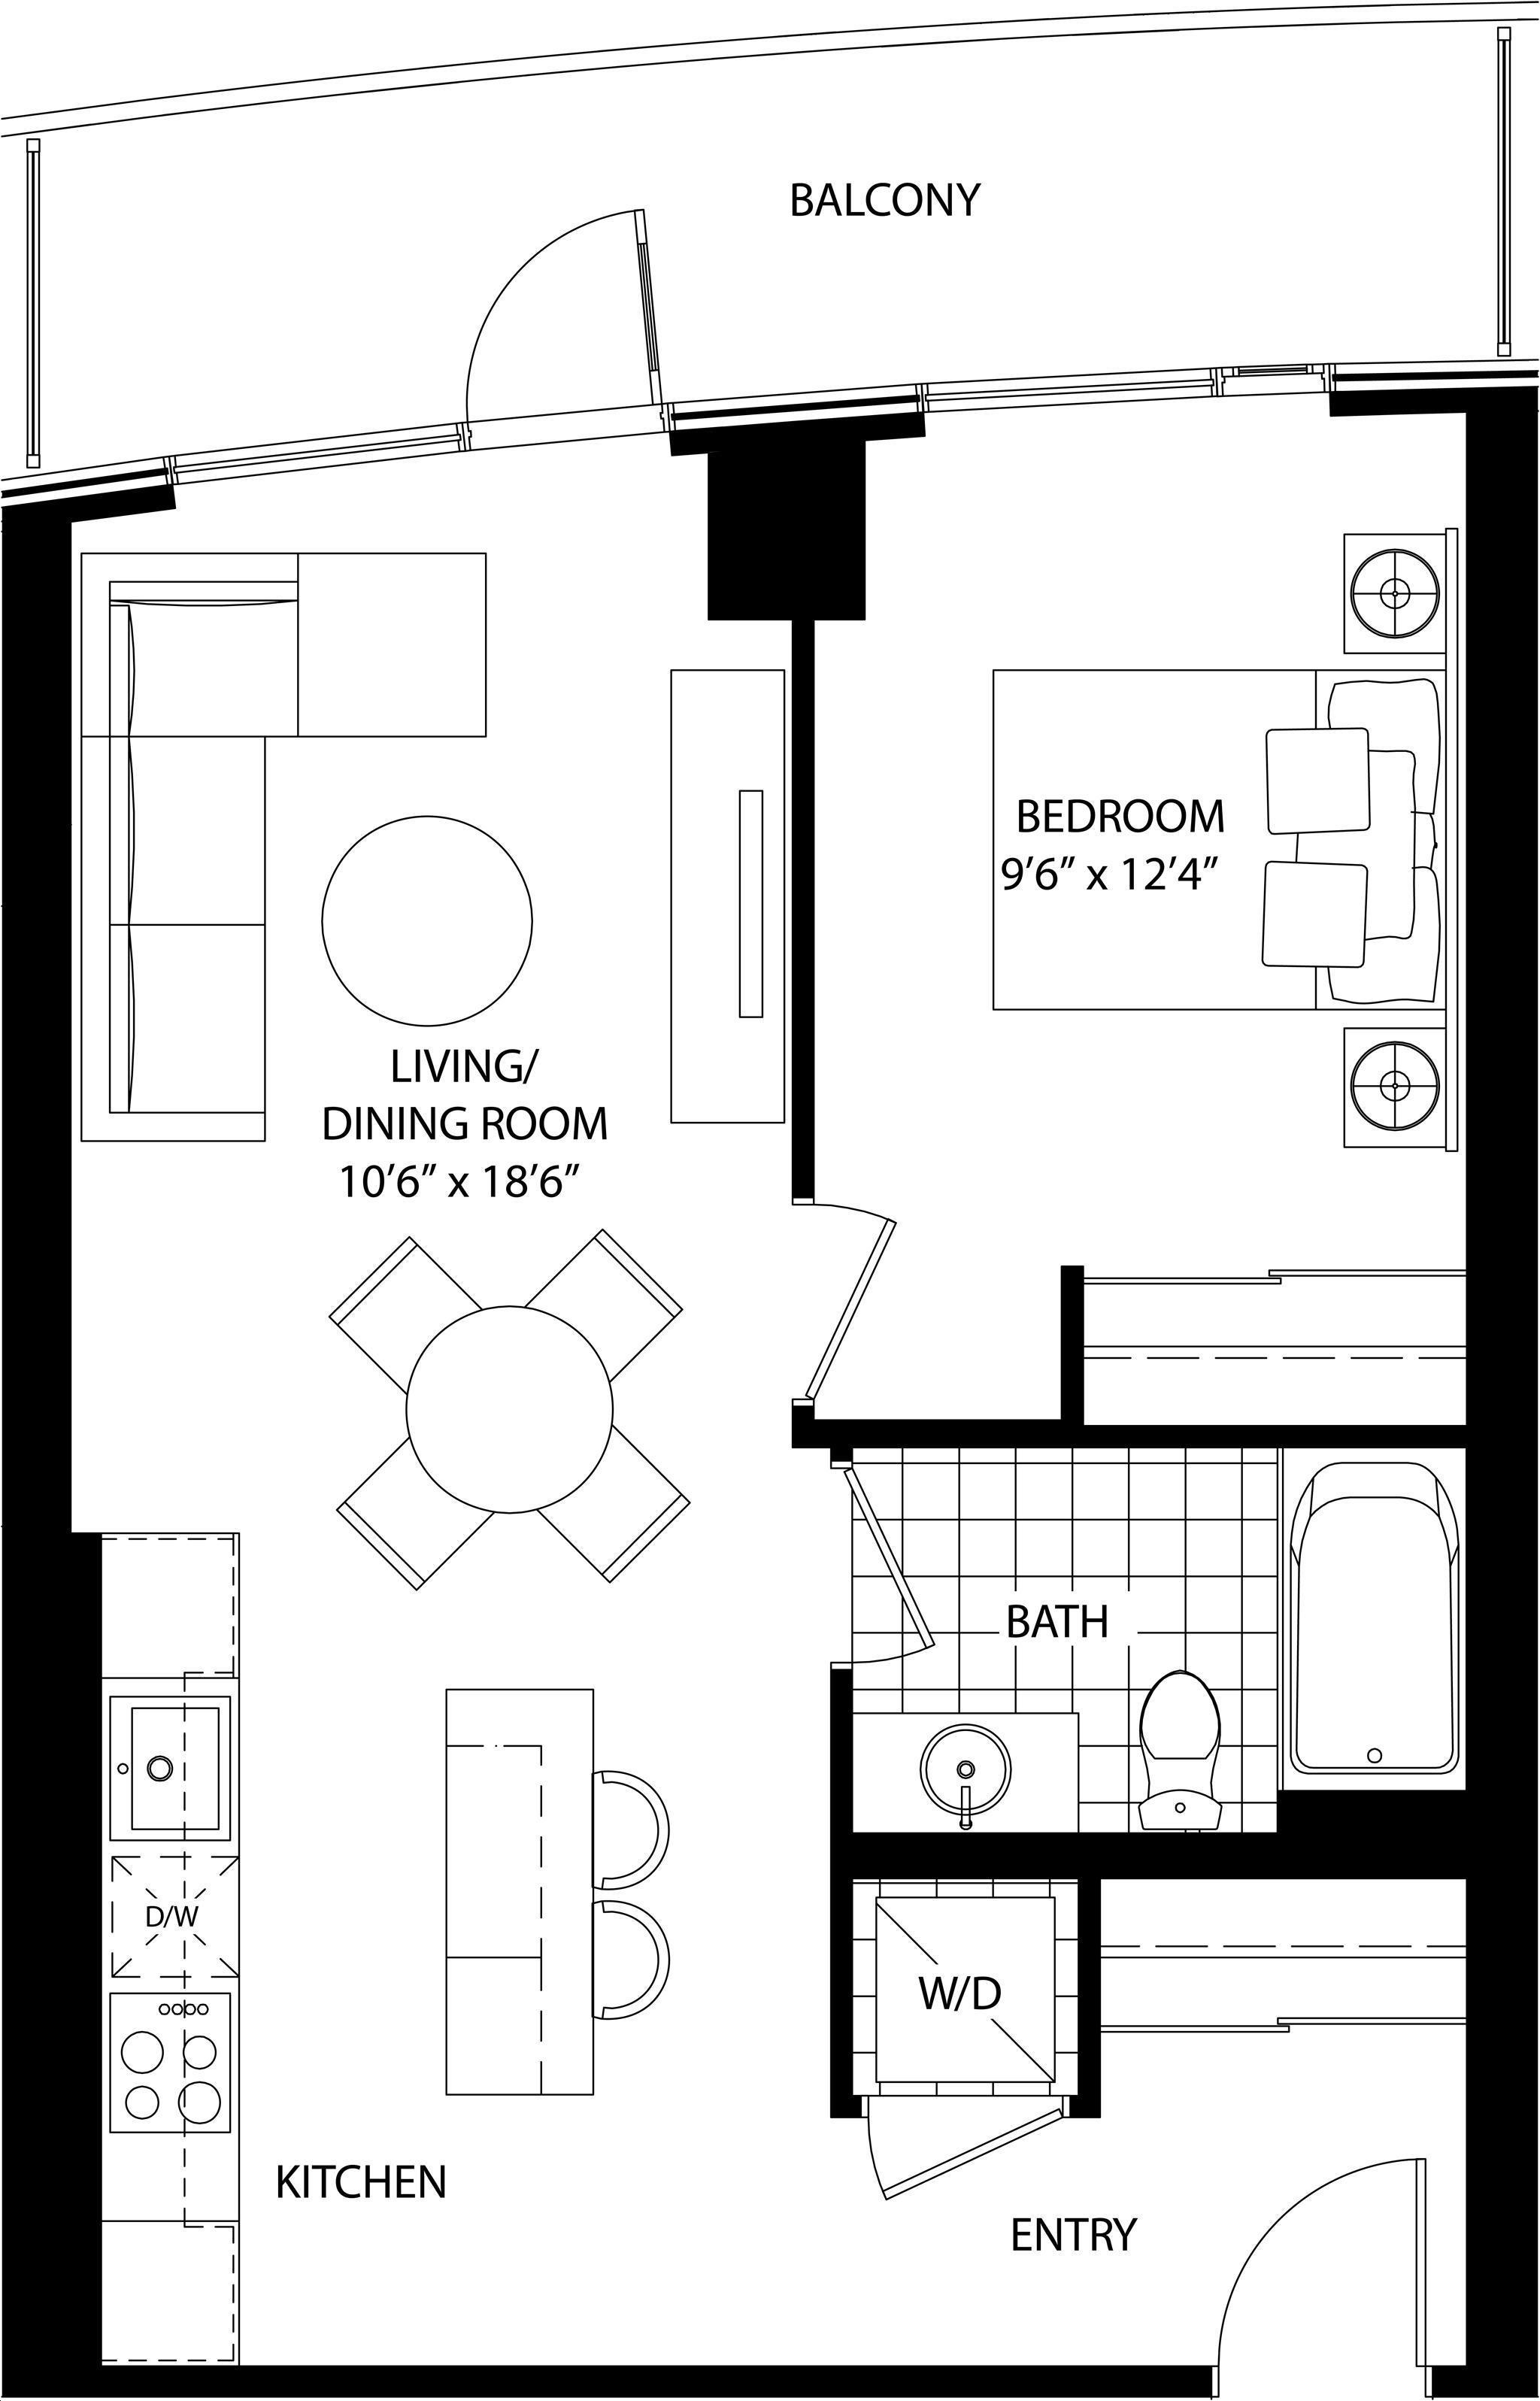 Cinema Tower By Daniels The Scott Floorplan 1 Bed 1 Bath